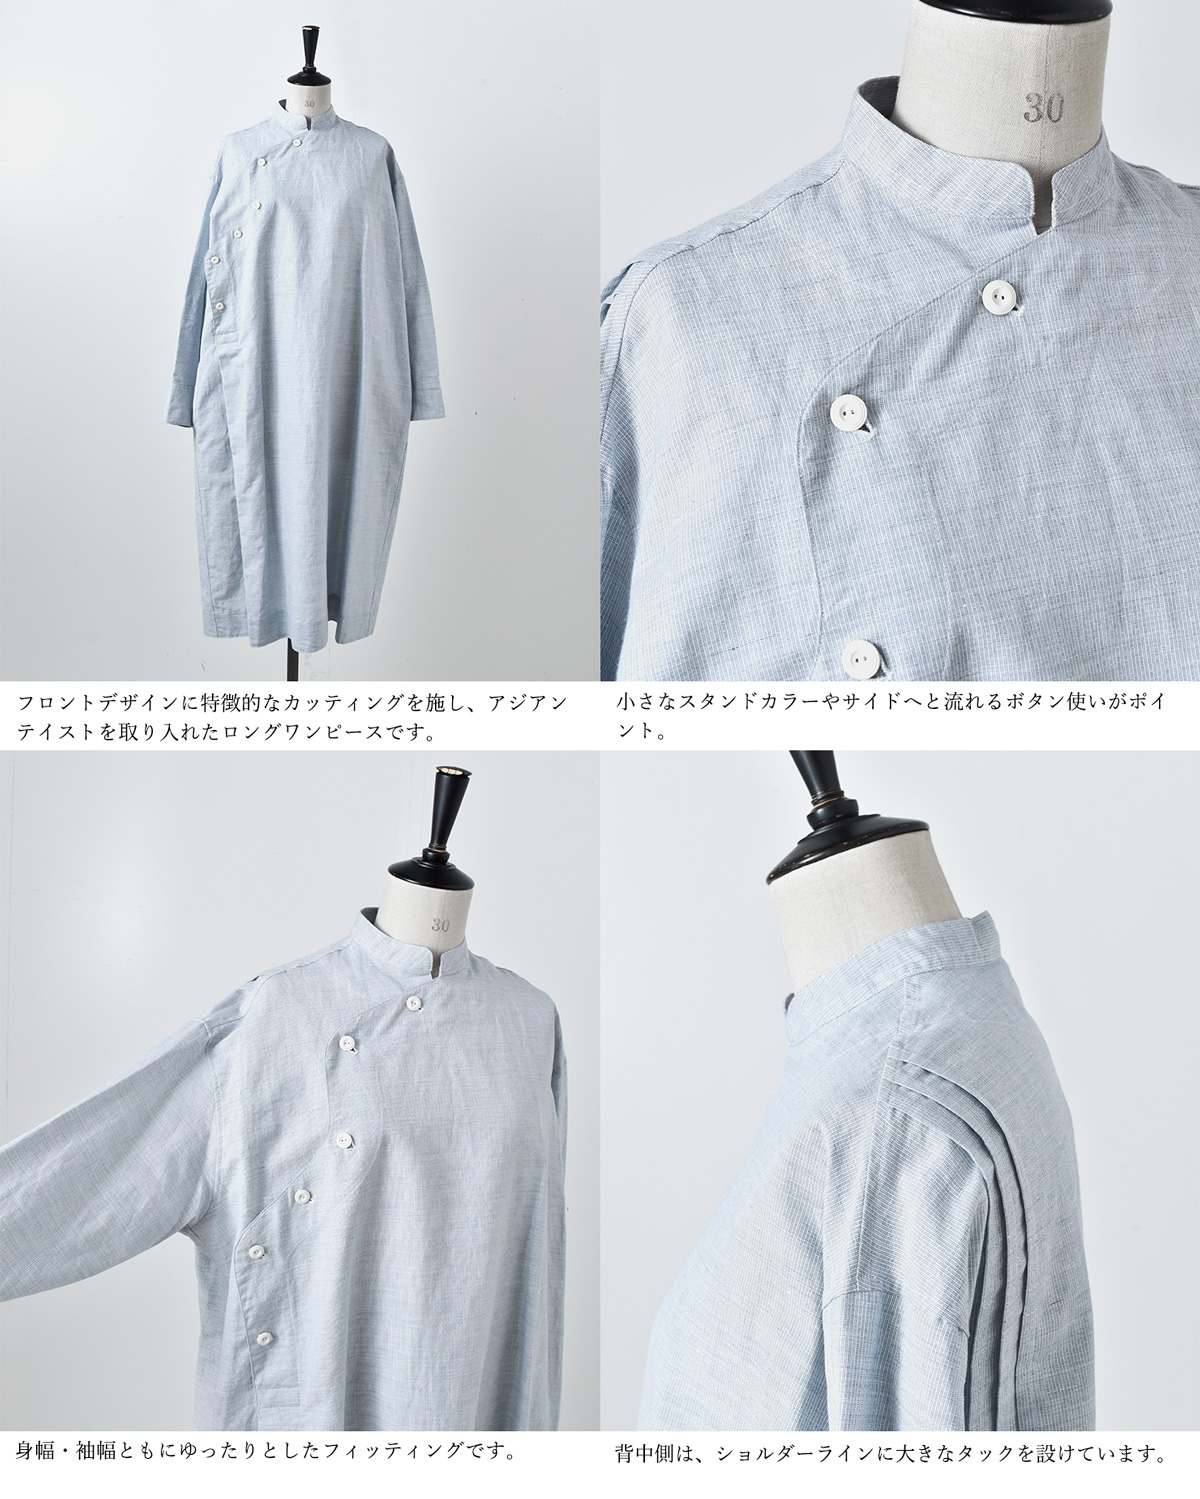 susuri(ススリ)コットンリネンマンダリンドレス 20-212